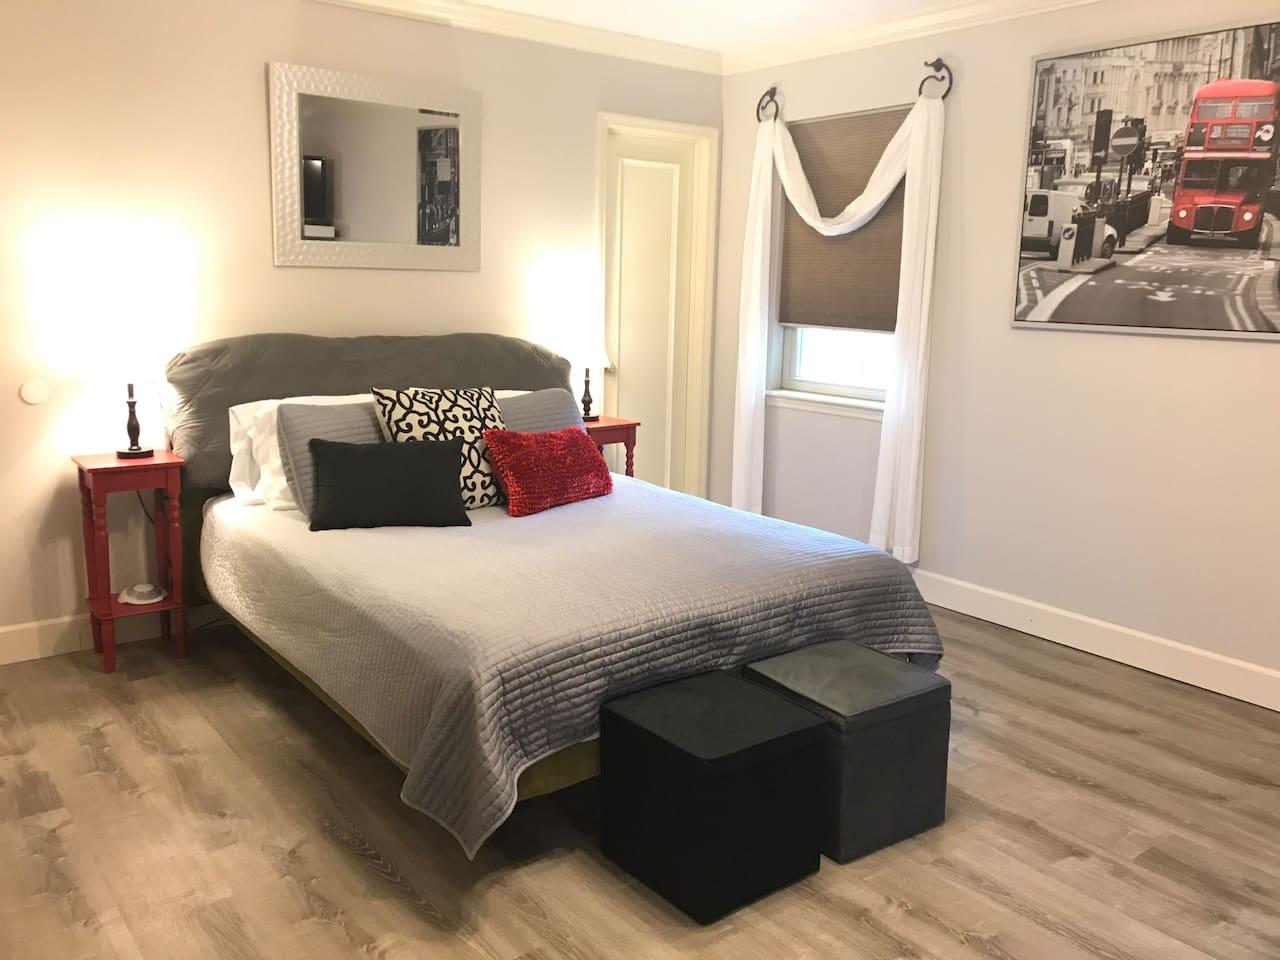 New comfortable Queen mattress and bedding.